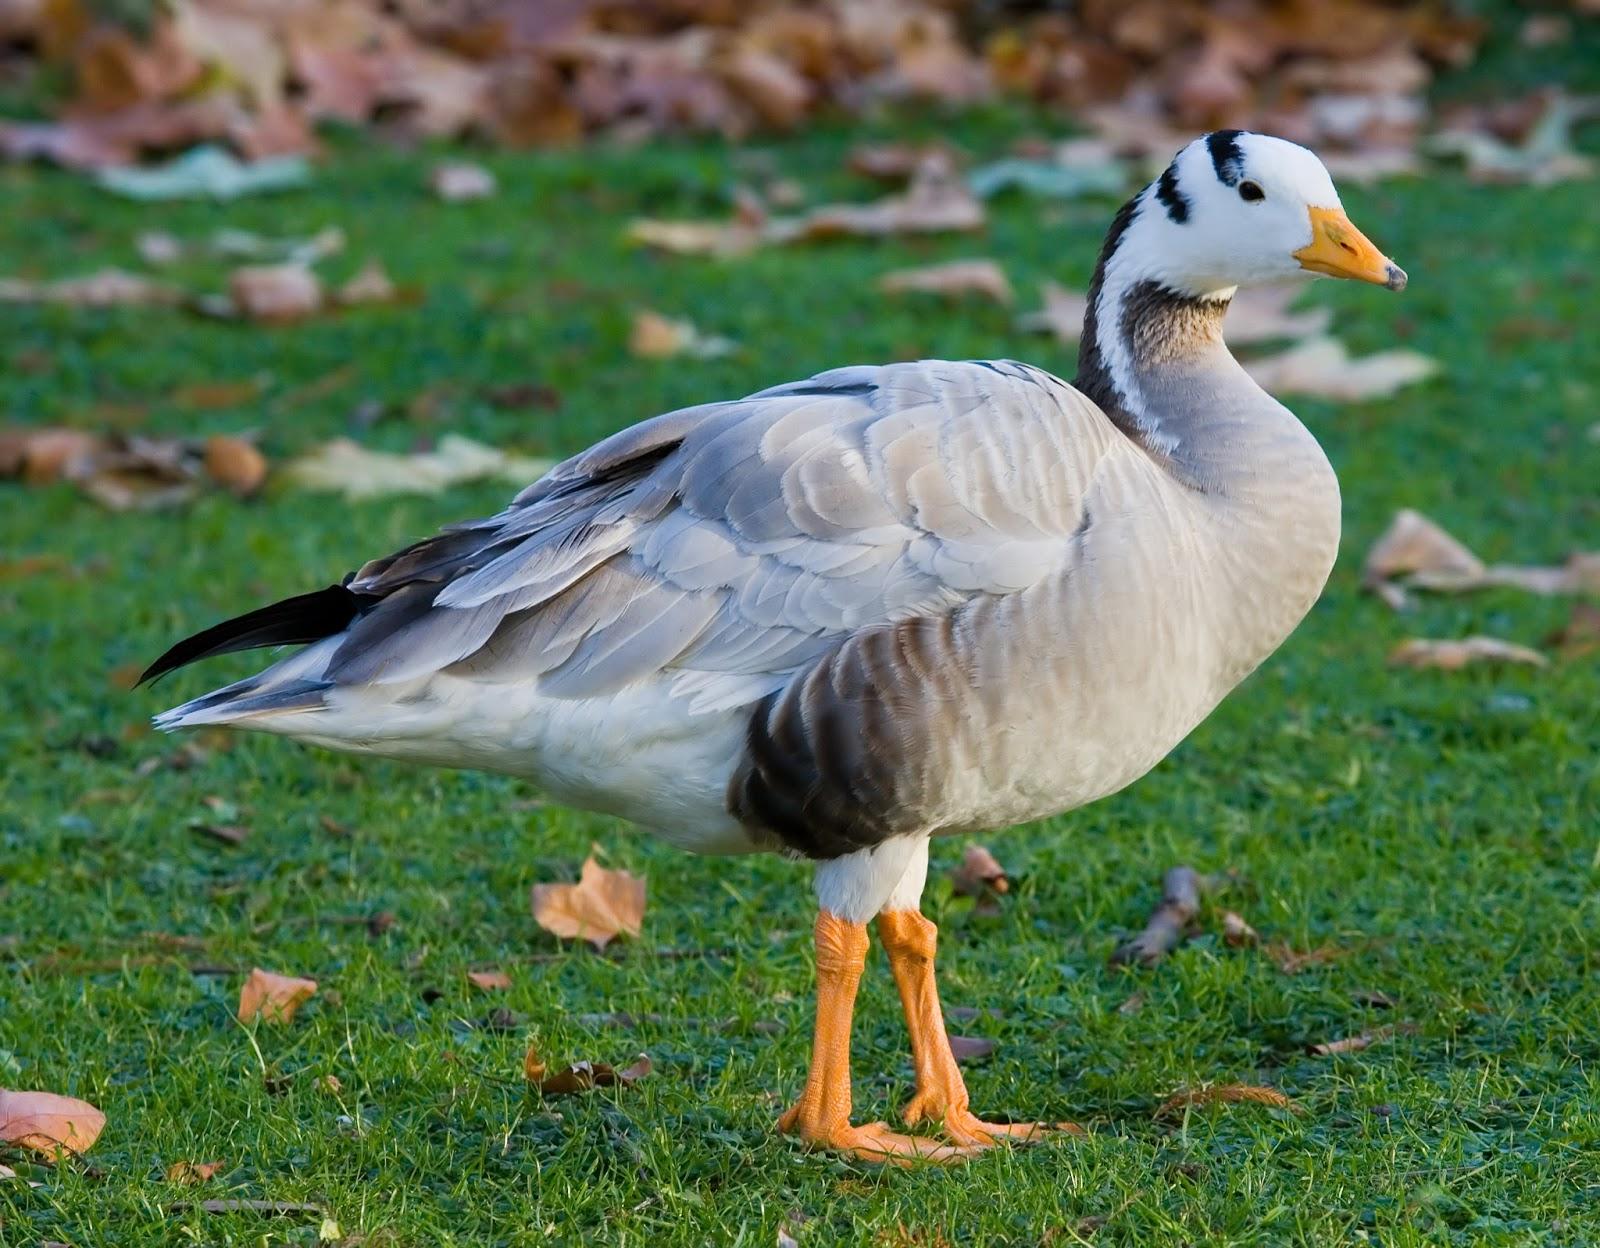 Tamilnadu Tourism: Melselvanur-Keelselvanur Bird Sanctuary